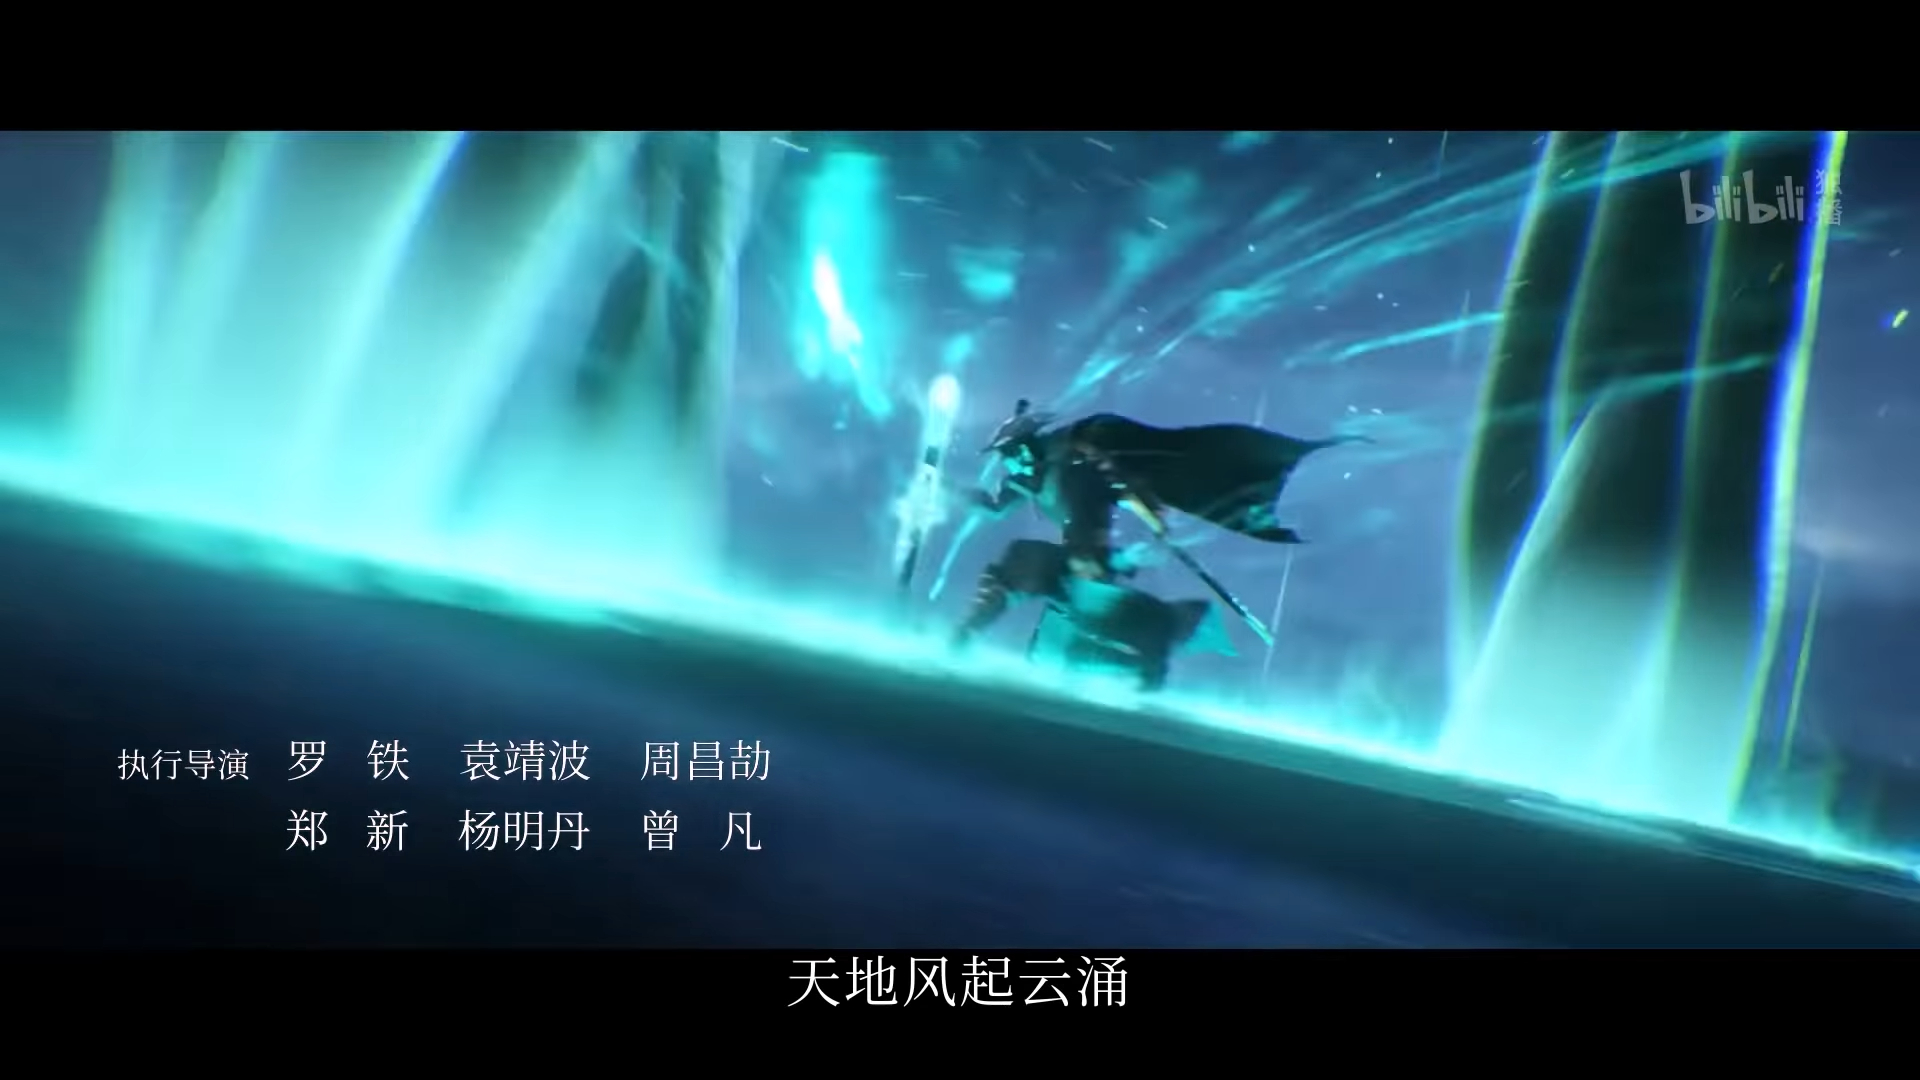 Dinghai Fusheng Lu - Dinghai Fusheng Records episode 02 english sub